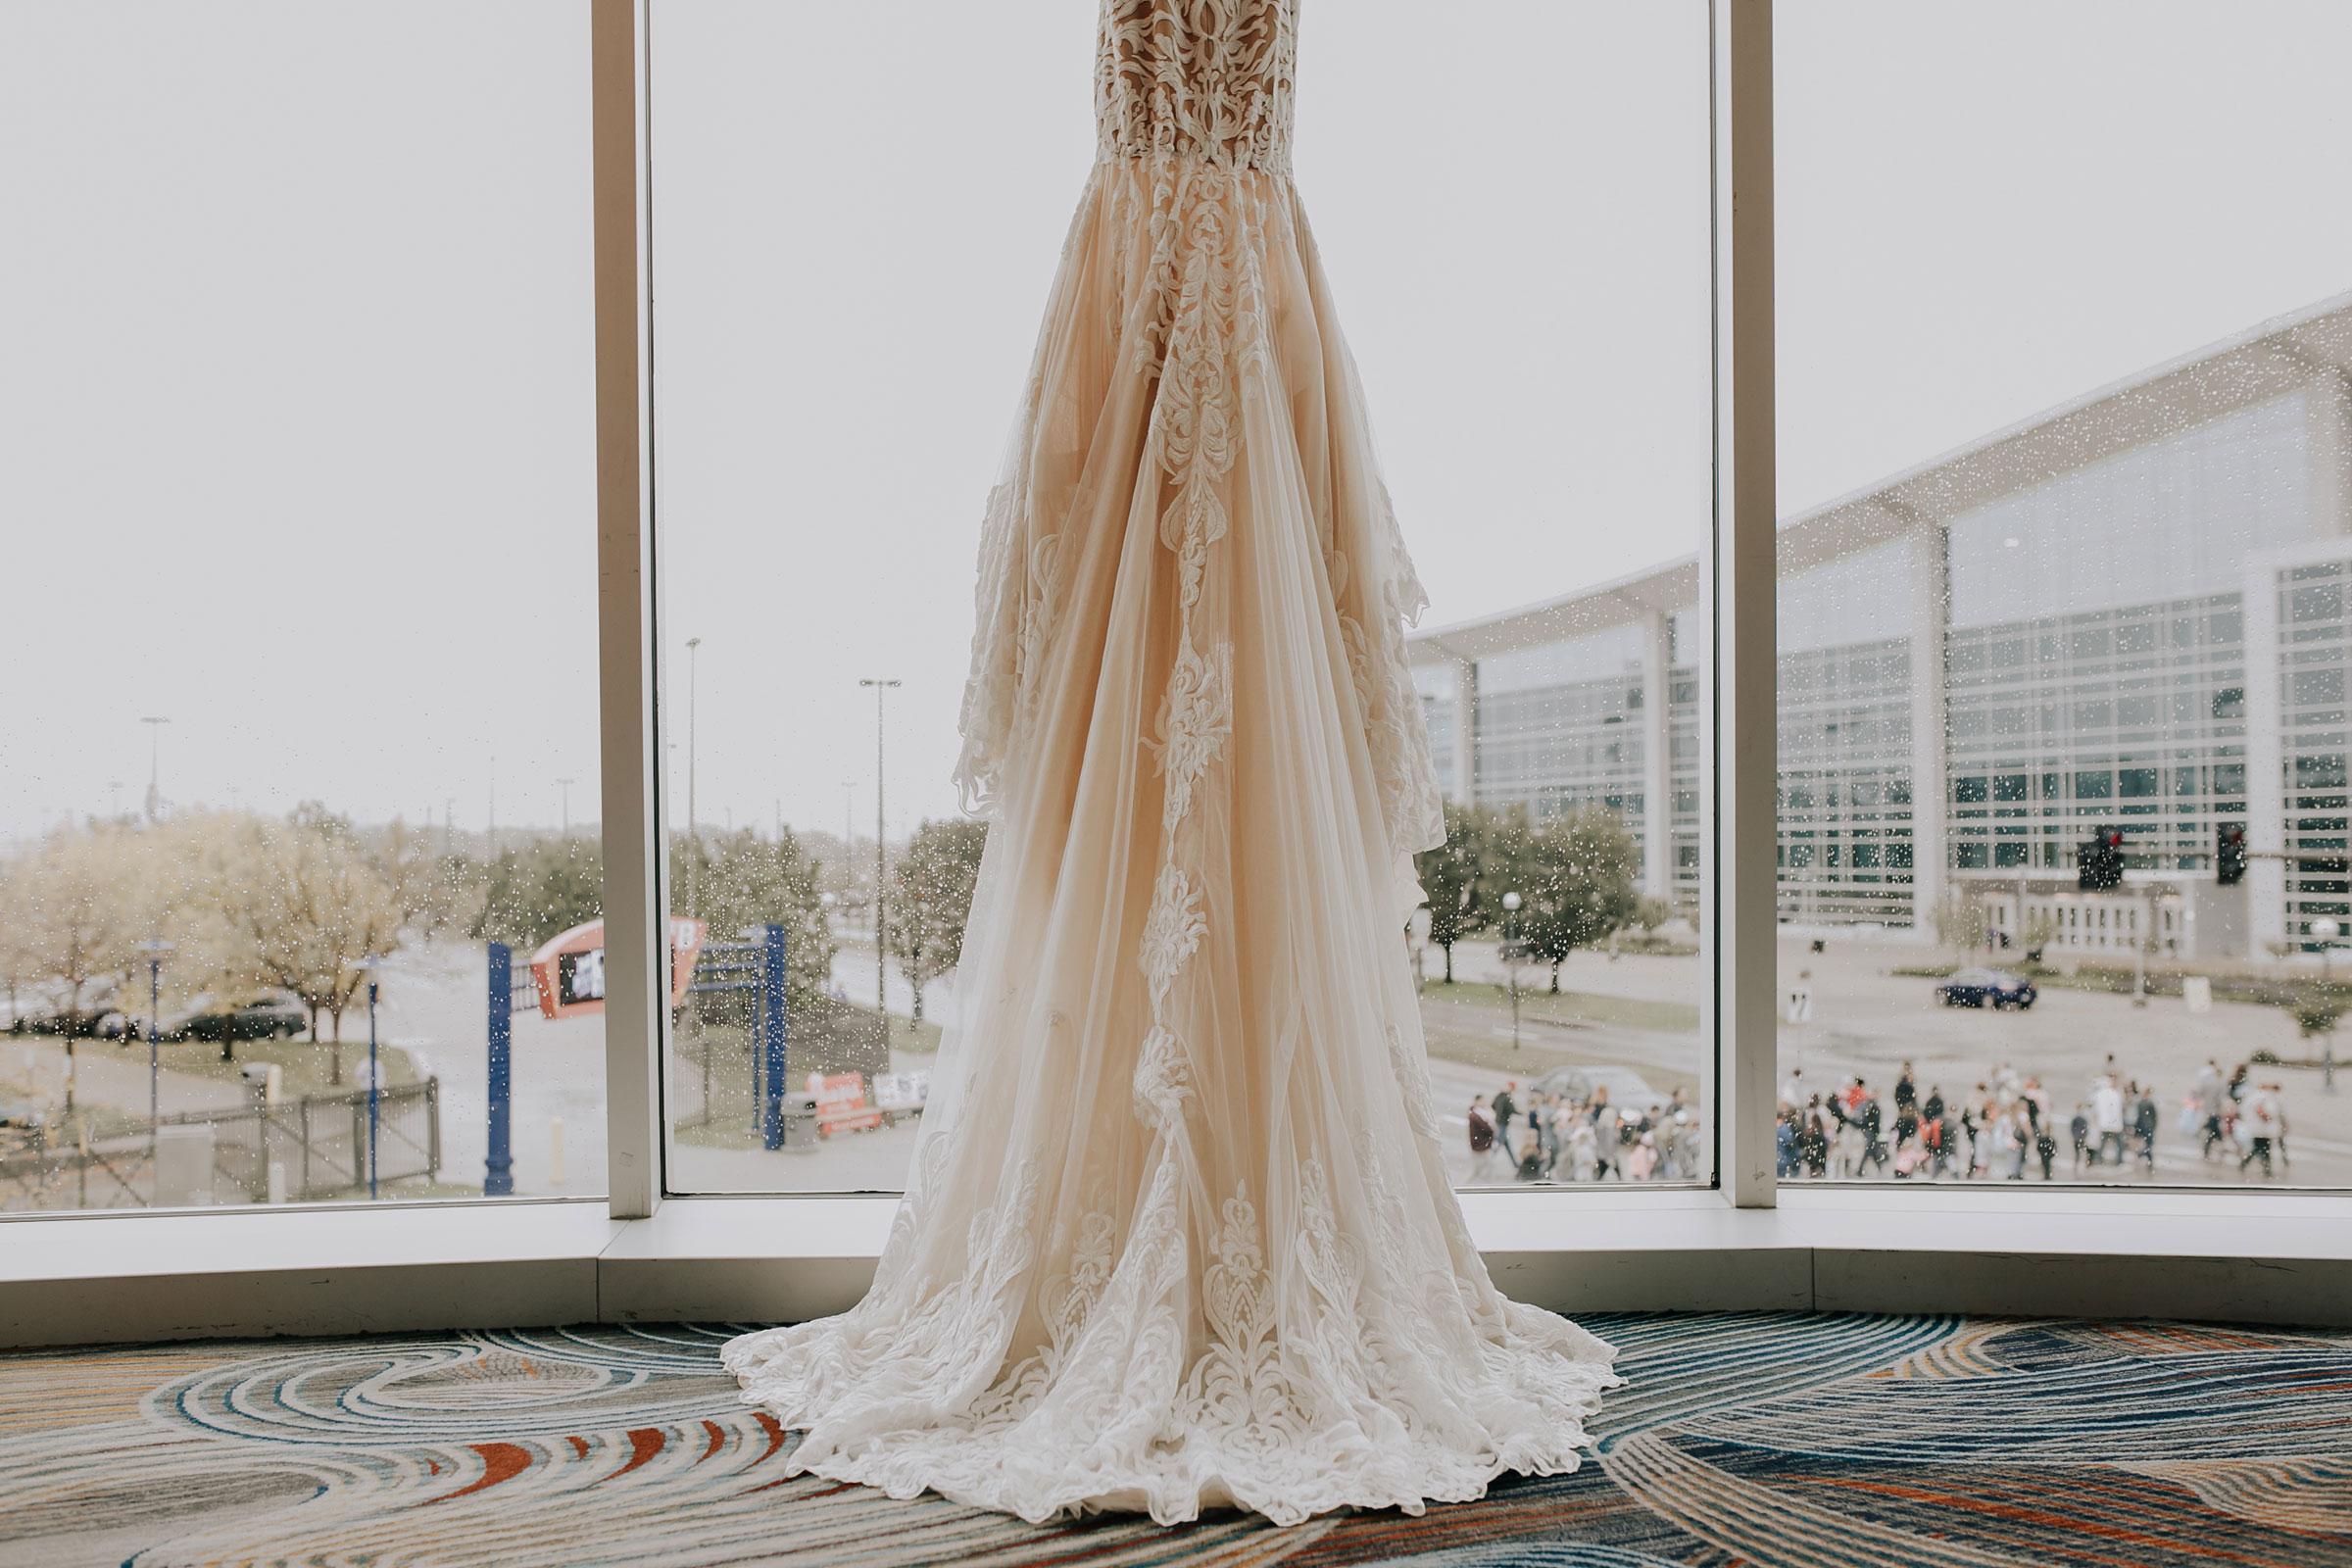 wedding-gown-back-hanging-in-window-hilton-omaha-nebraska-raelyn-ramey-photography.jpg